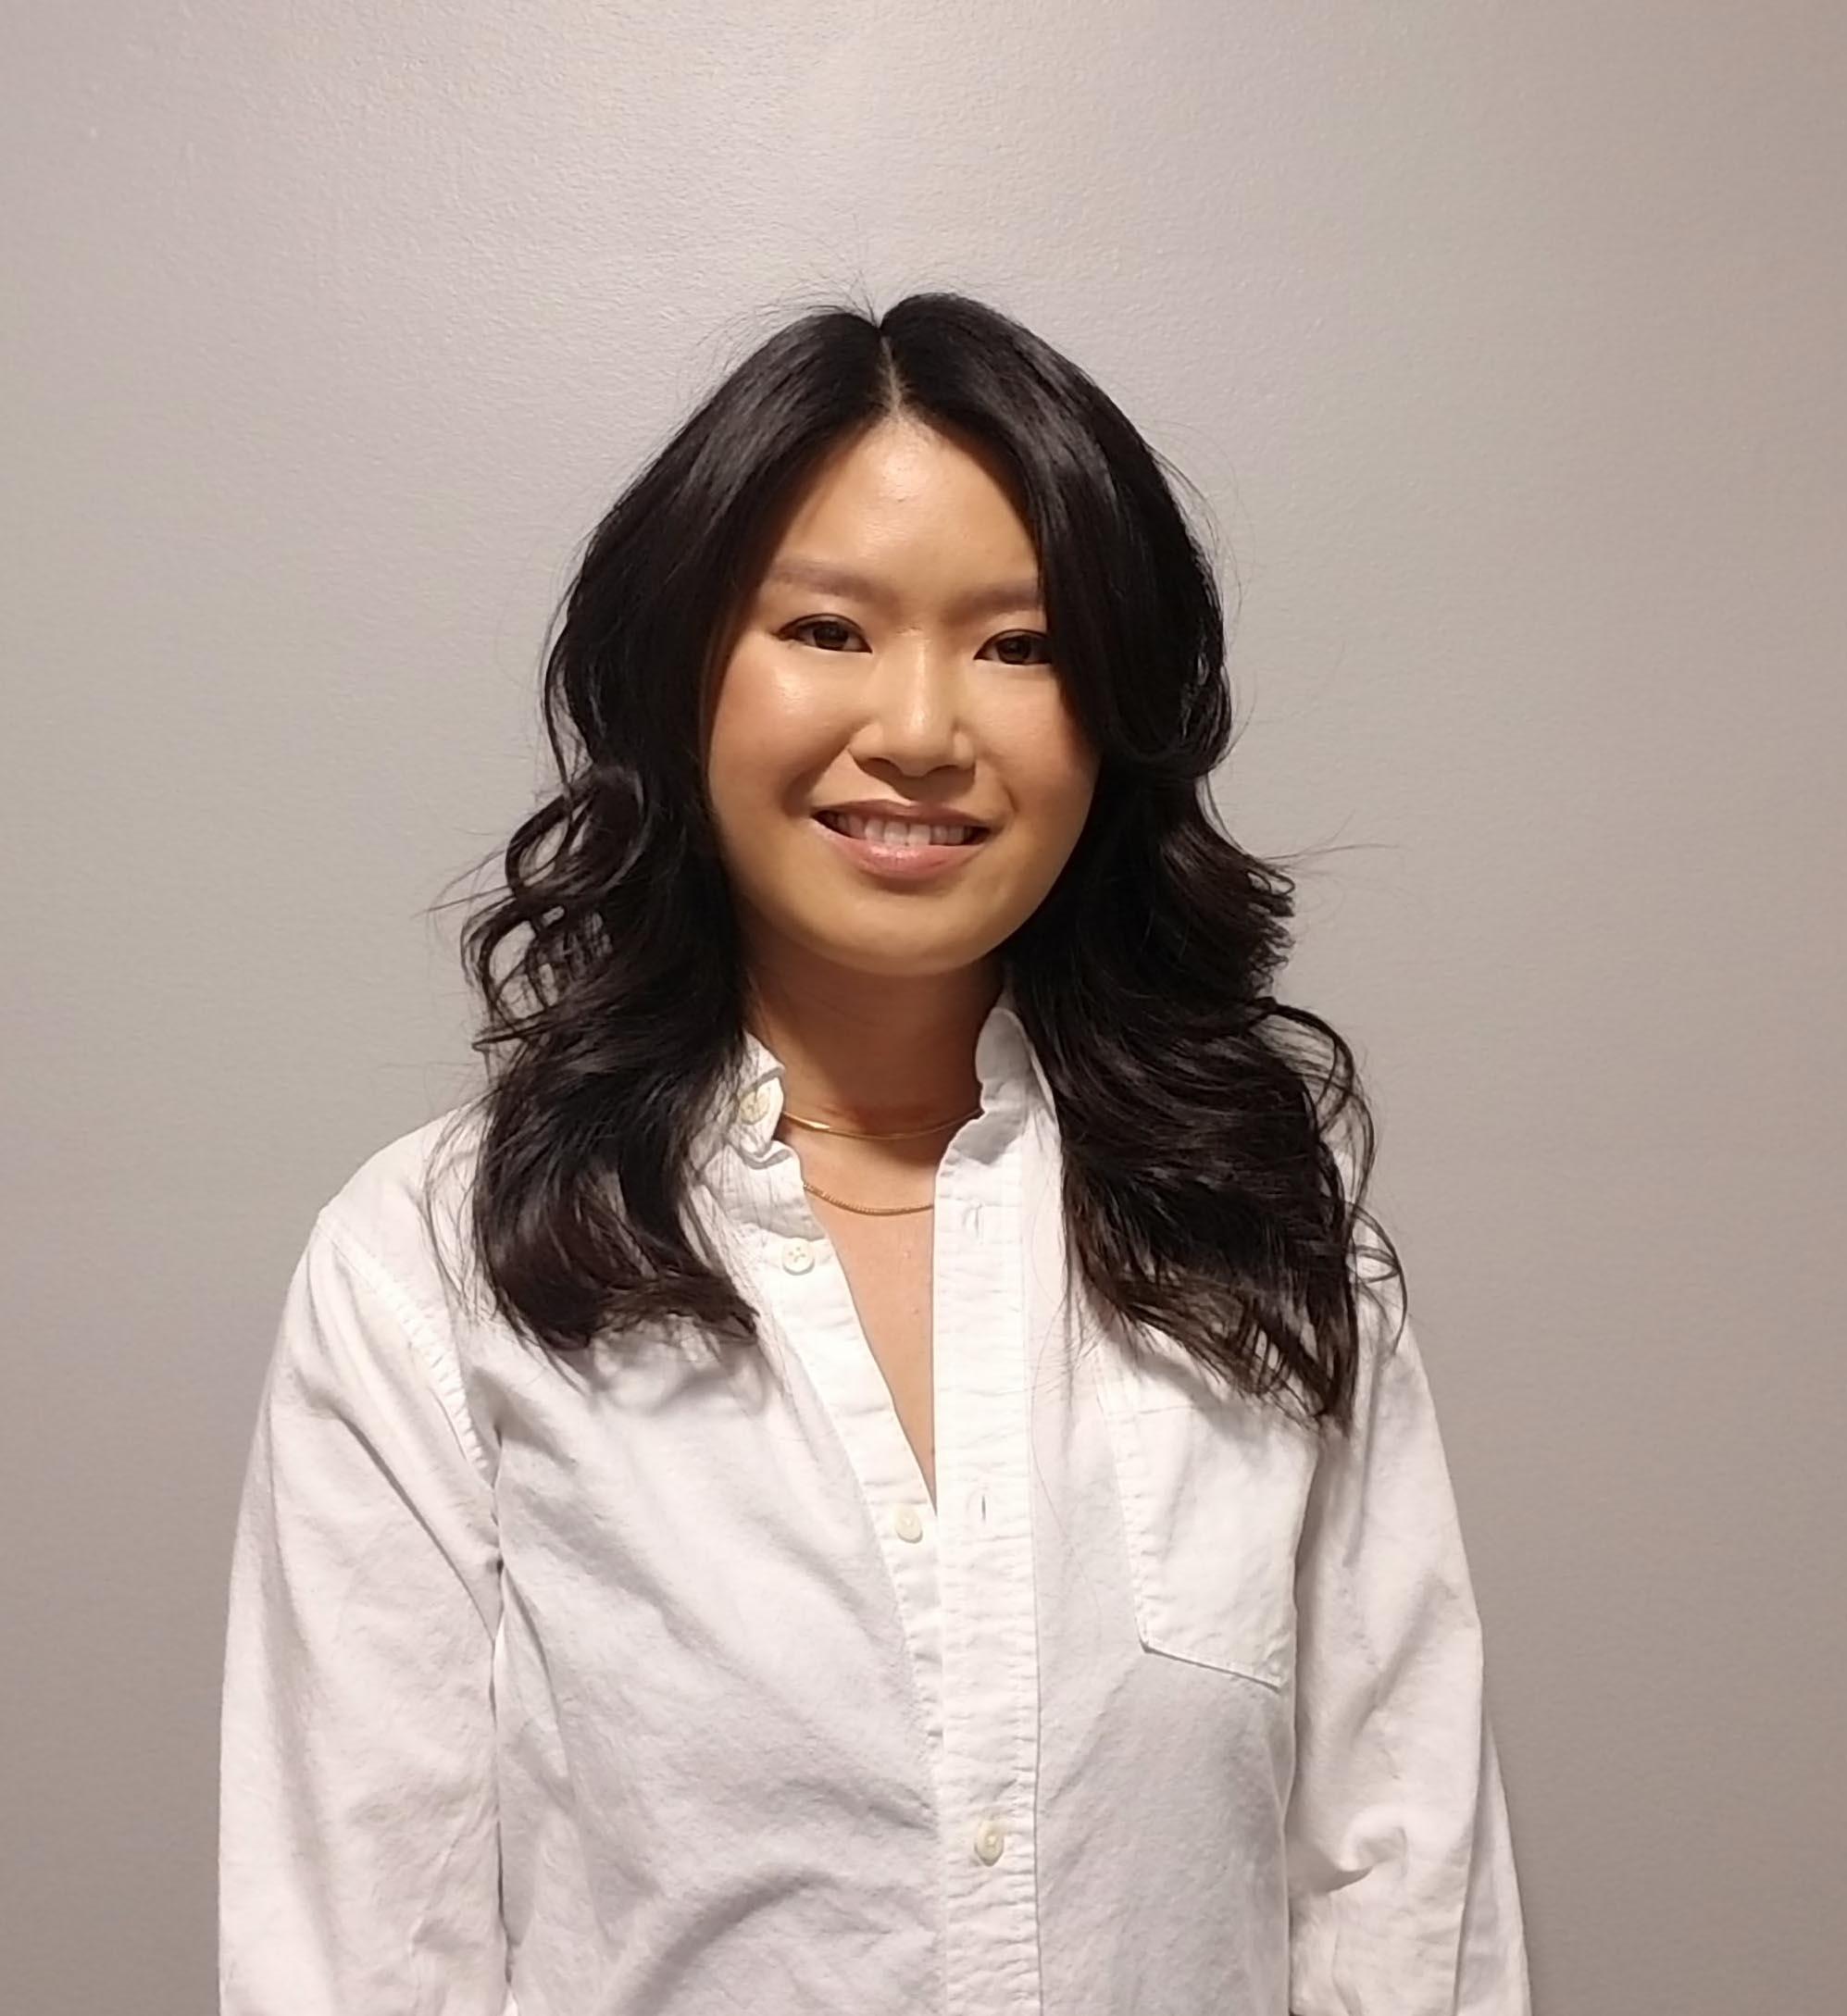 Jasmine Chan